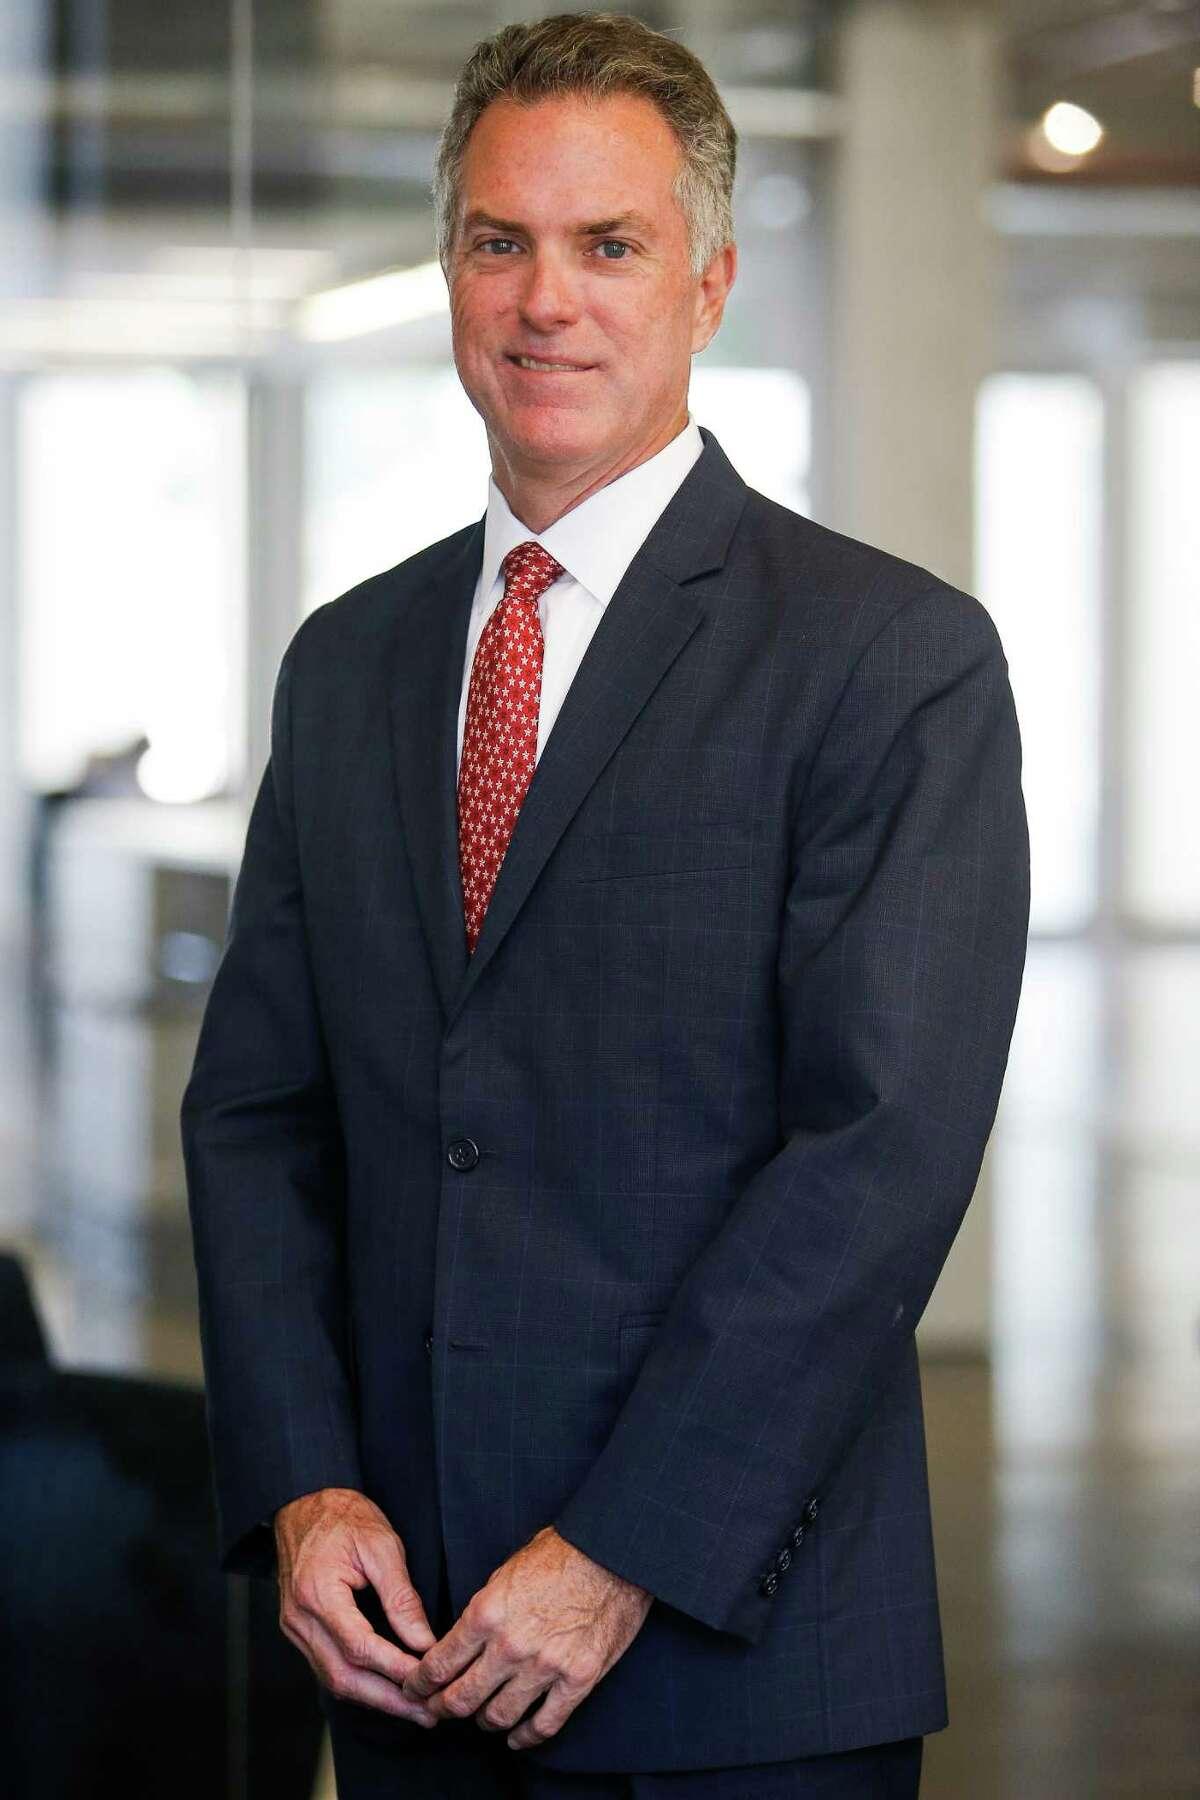 Edboard headshot of candidate John Luman Wednesday, Sept. 21, 2016 in Houston.